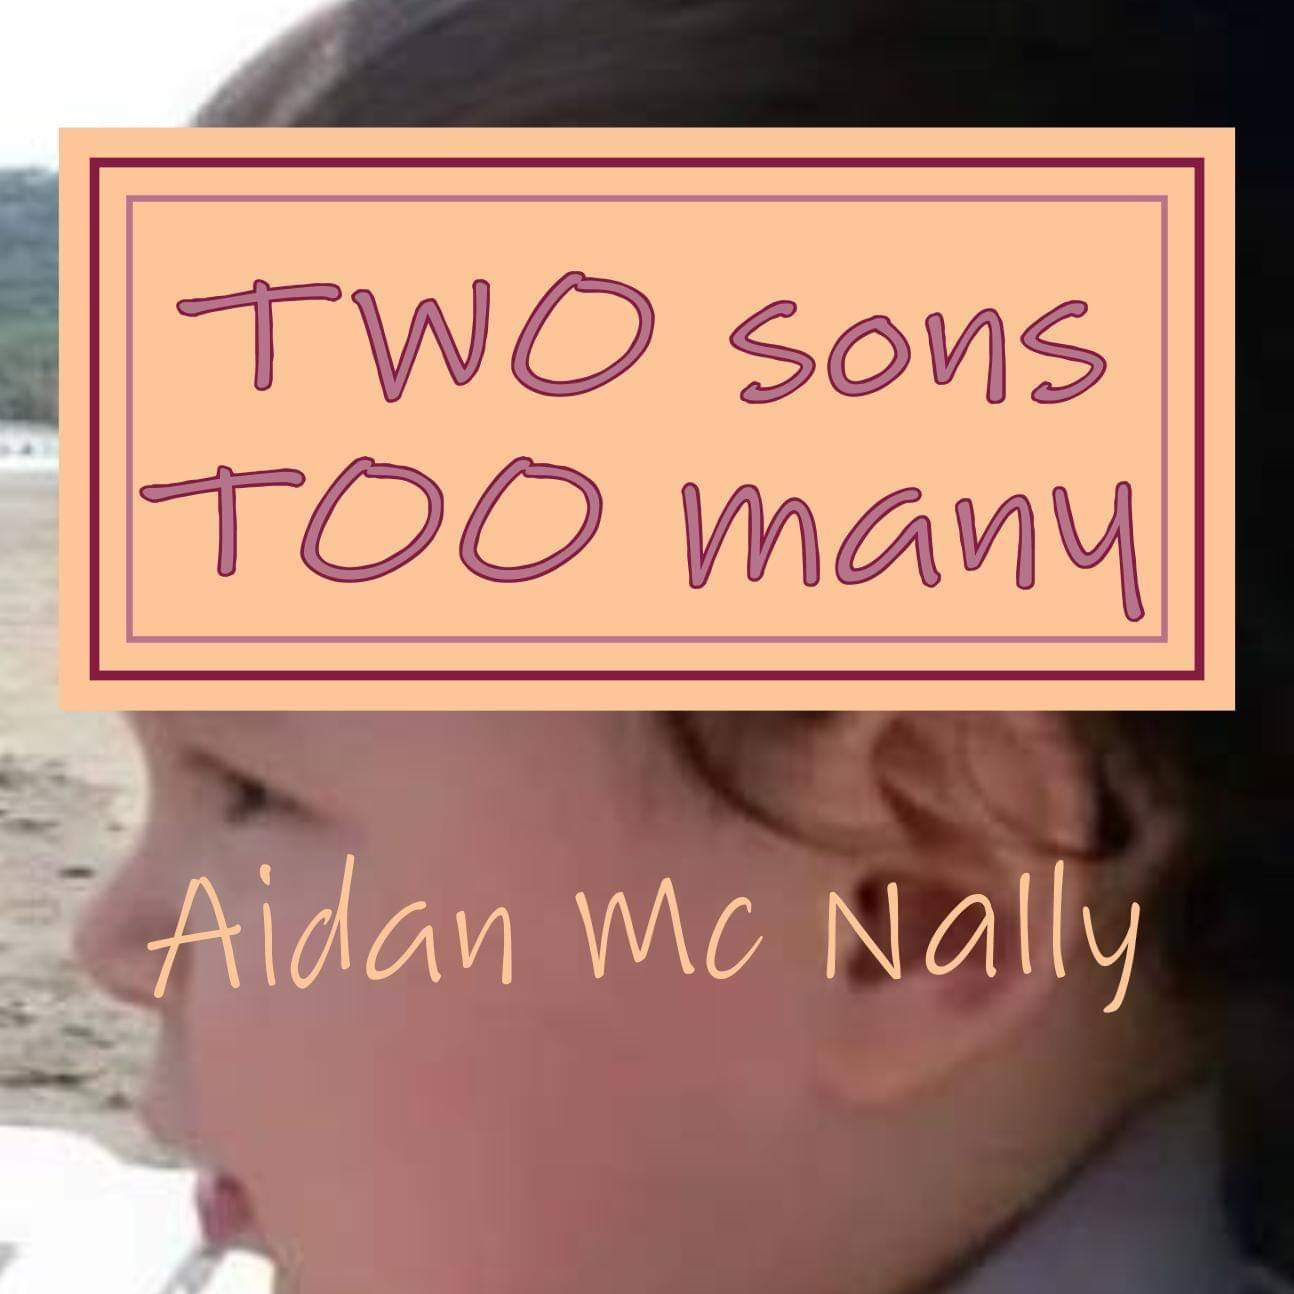 TWO sons TOO many, Memoir by Aidan Mc Nally